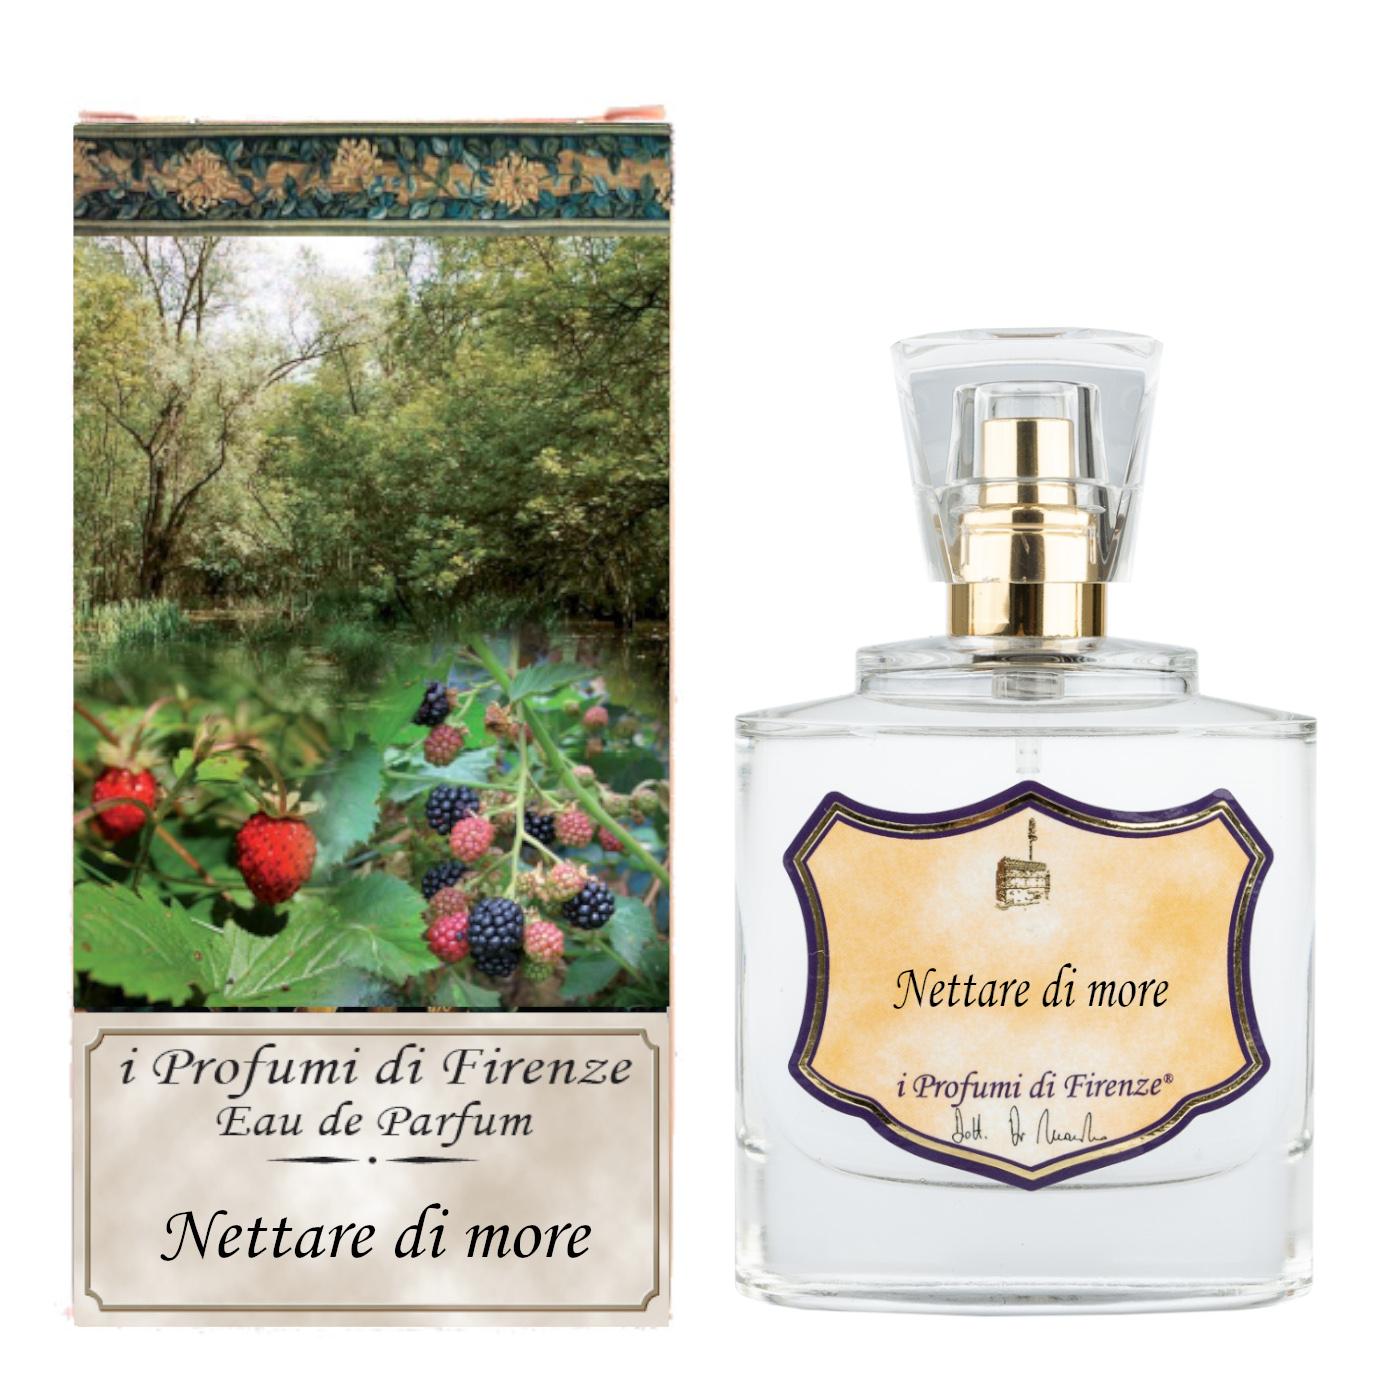 NETTARE DI MORE - Eau de Parfum-0